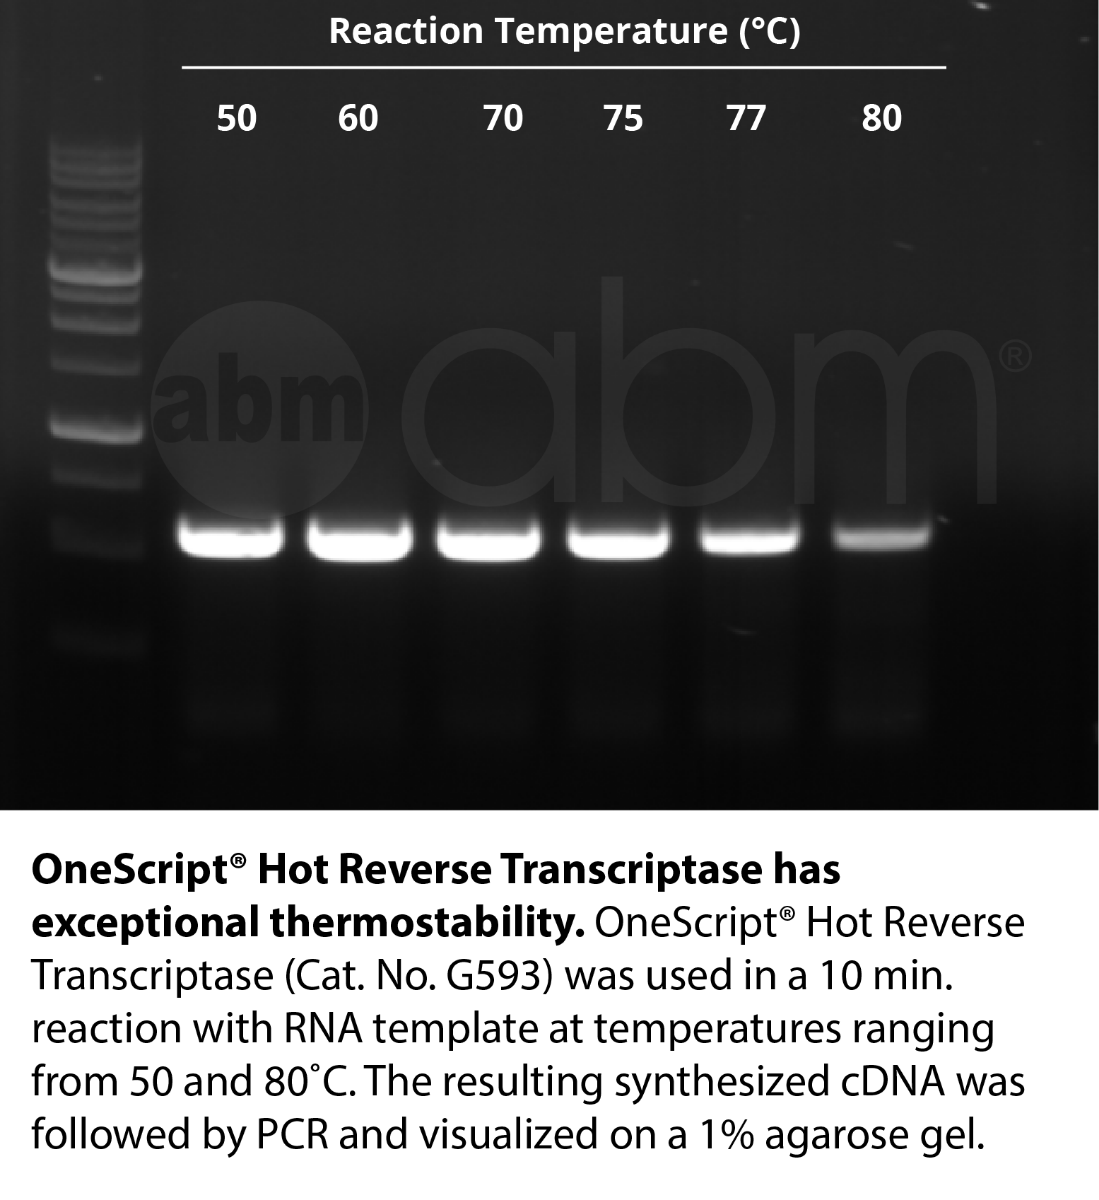 OneScript® Hot Reverse Transcriptase